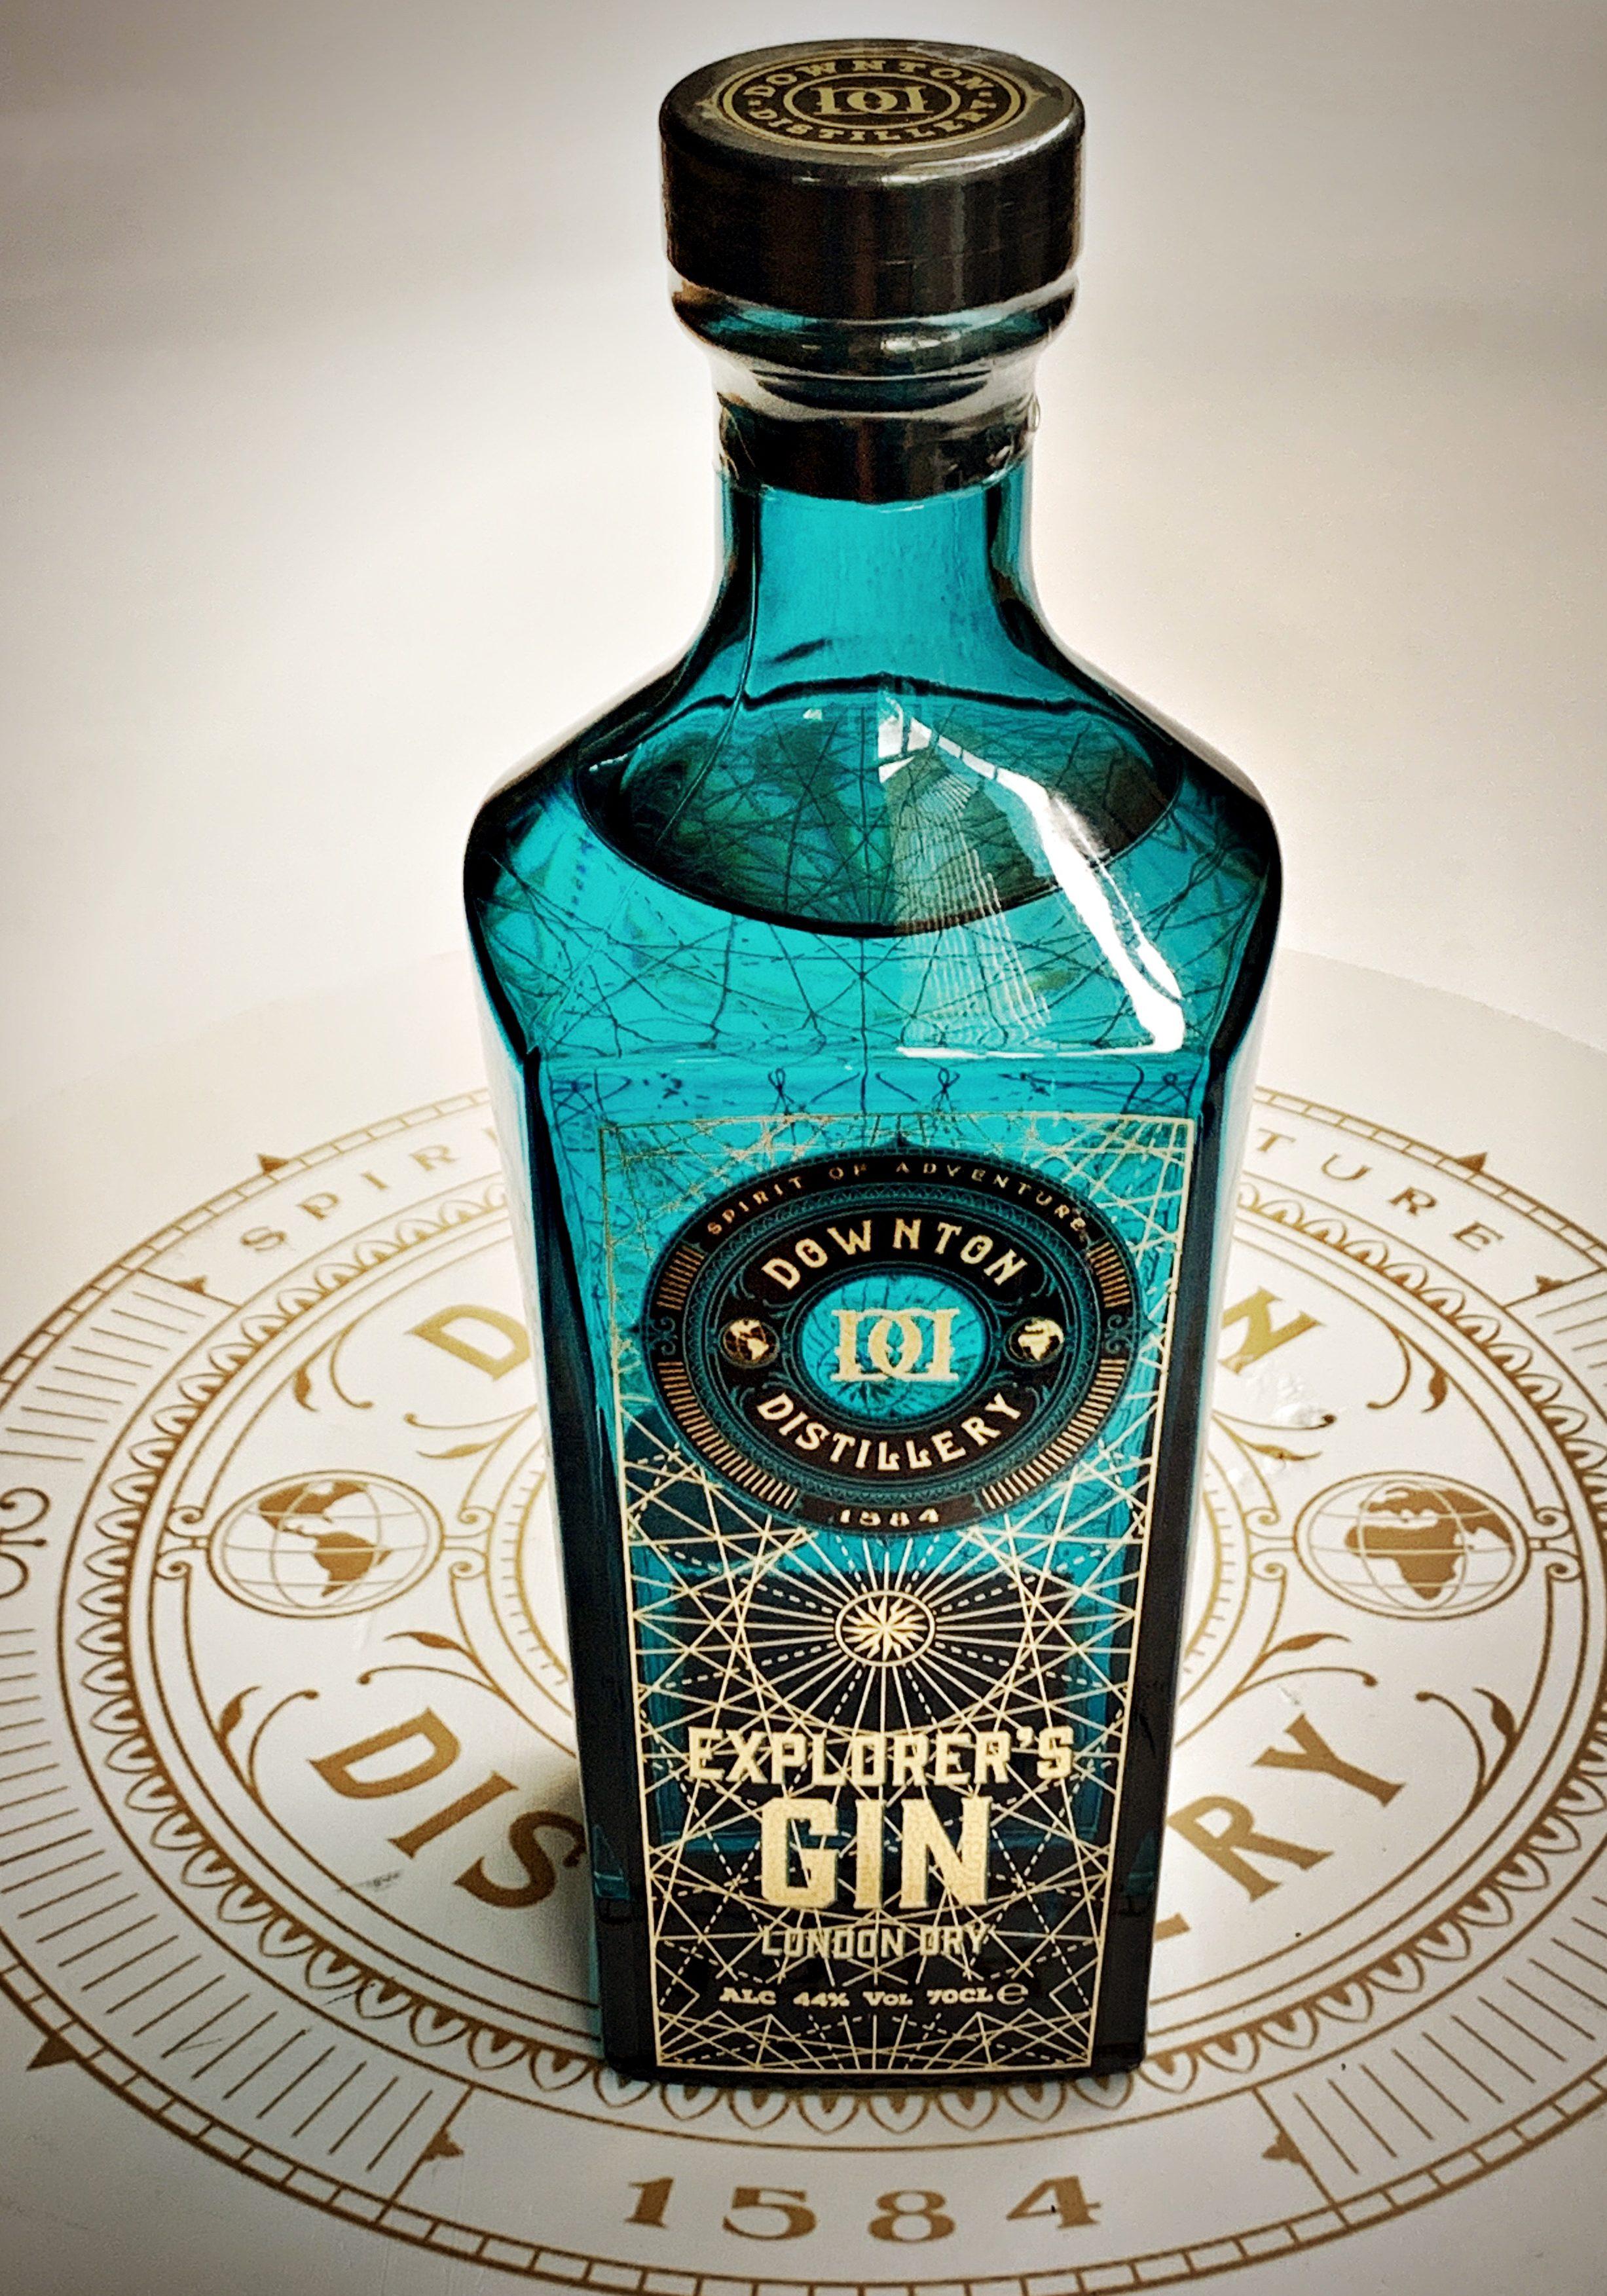 Wiltshire Gin Salisbury